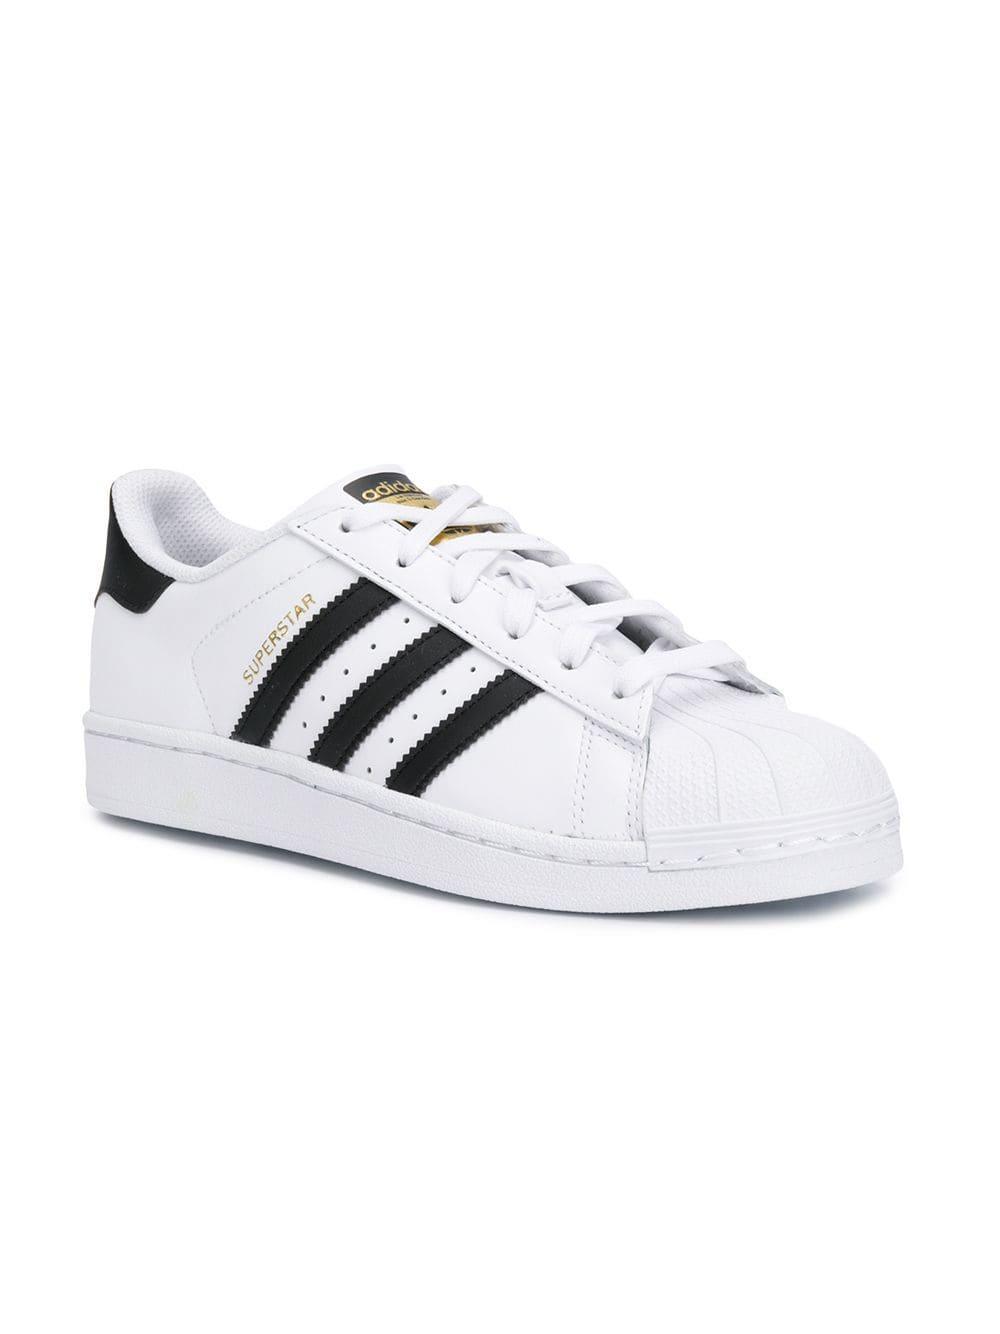 a7da3cacff8c Lyst - Adidas Superstar Sneakers in White